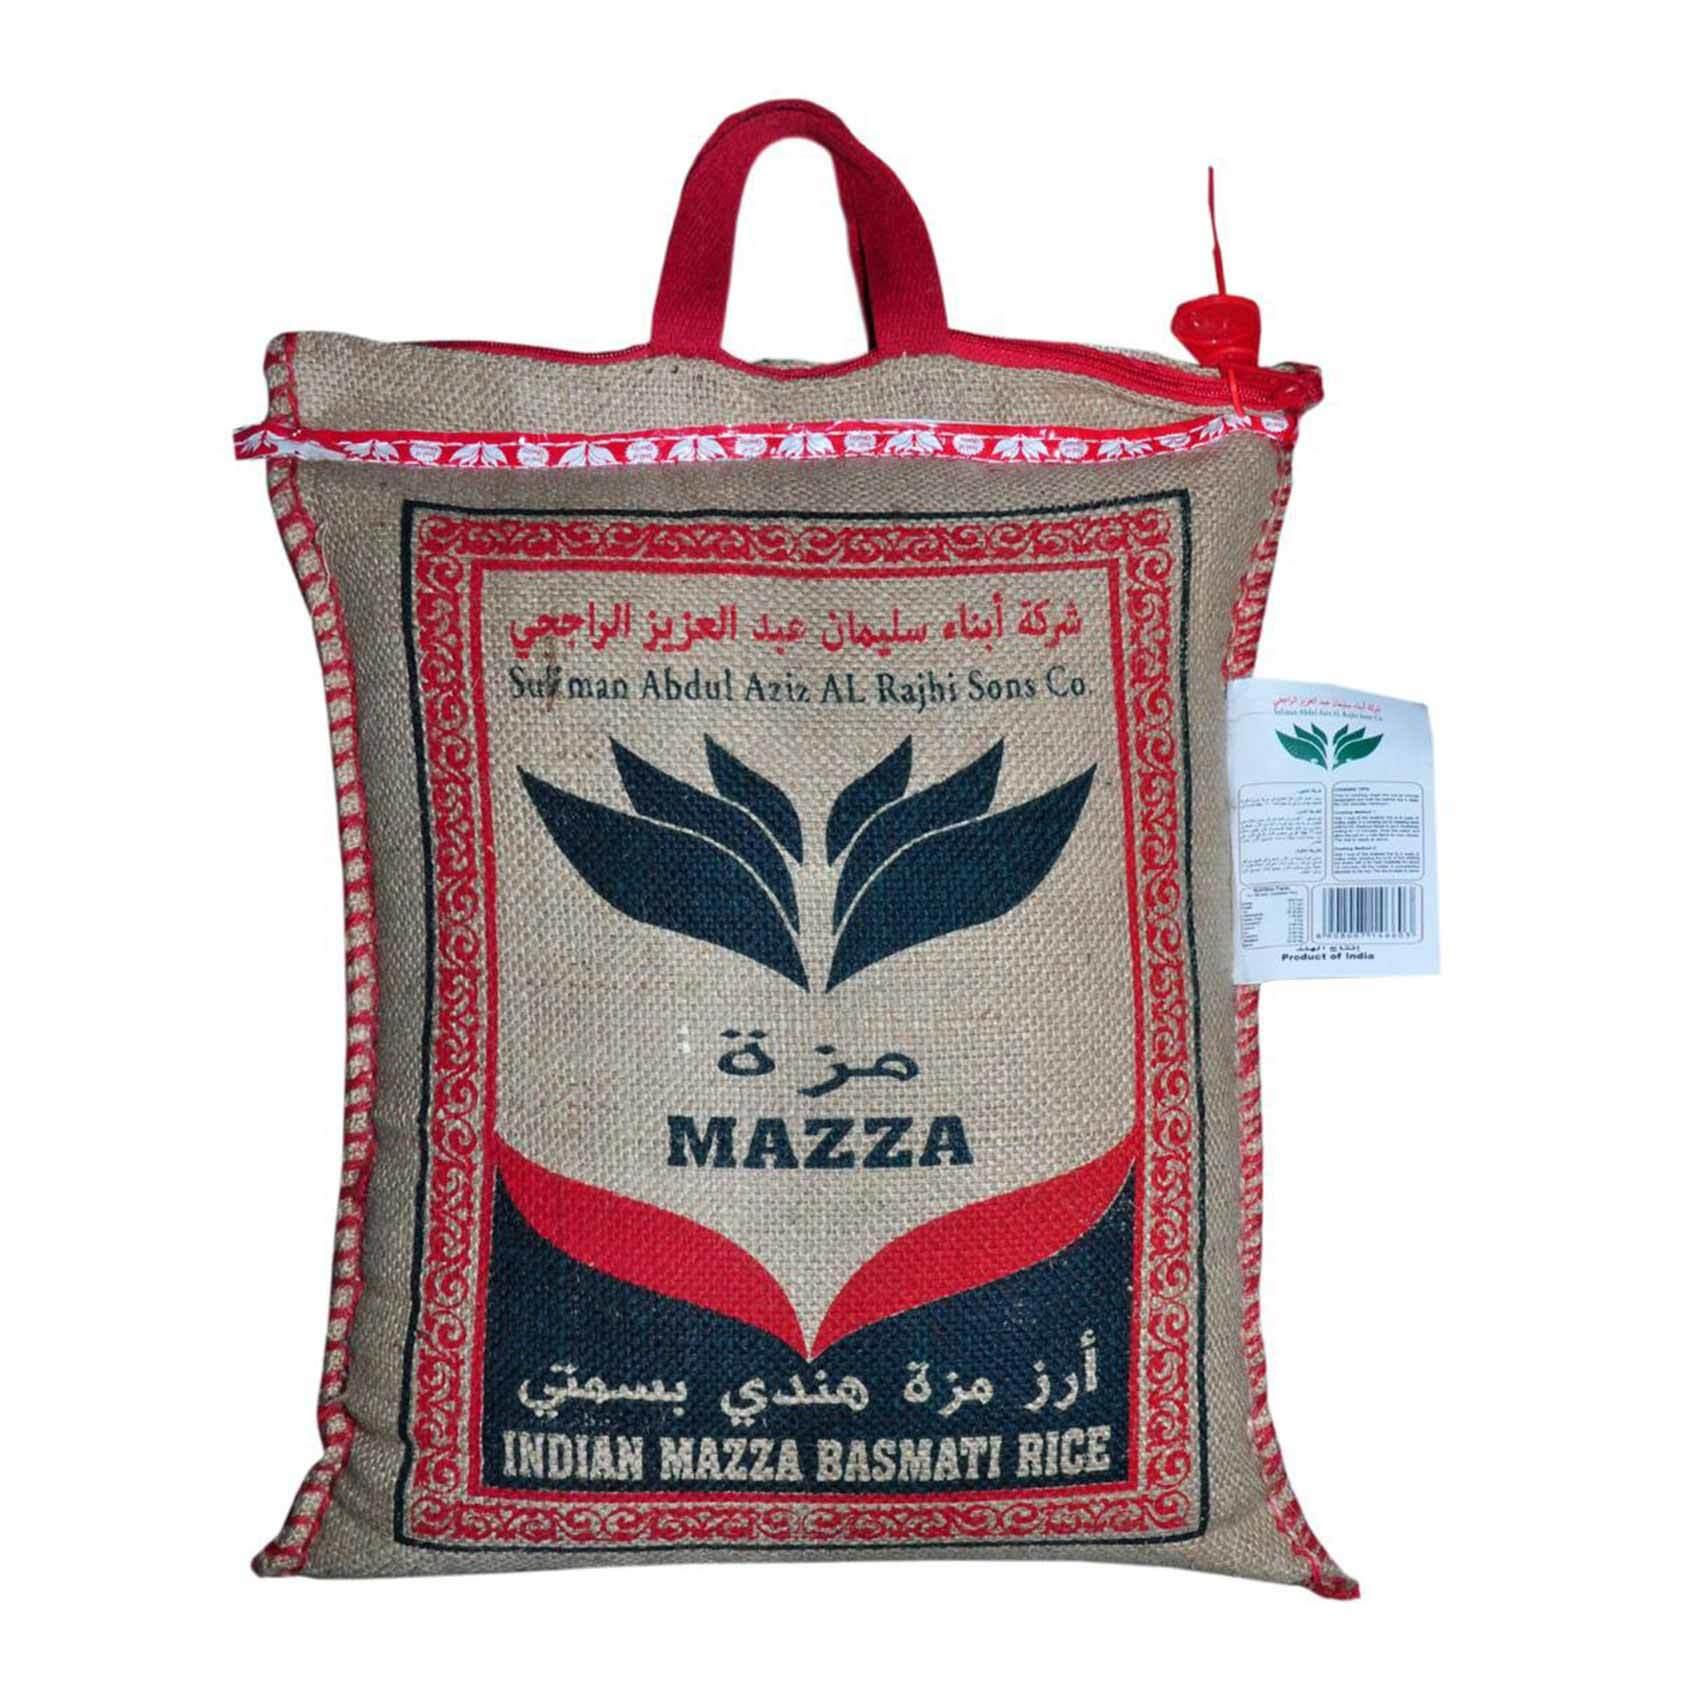 Buy Alrajhi Mazza Basmati Rice 5 Kg Online Shop Food Cupboard On Carrefour Saudi Arabia